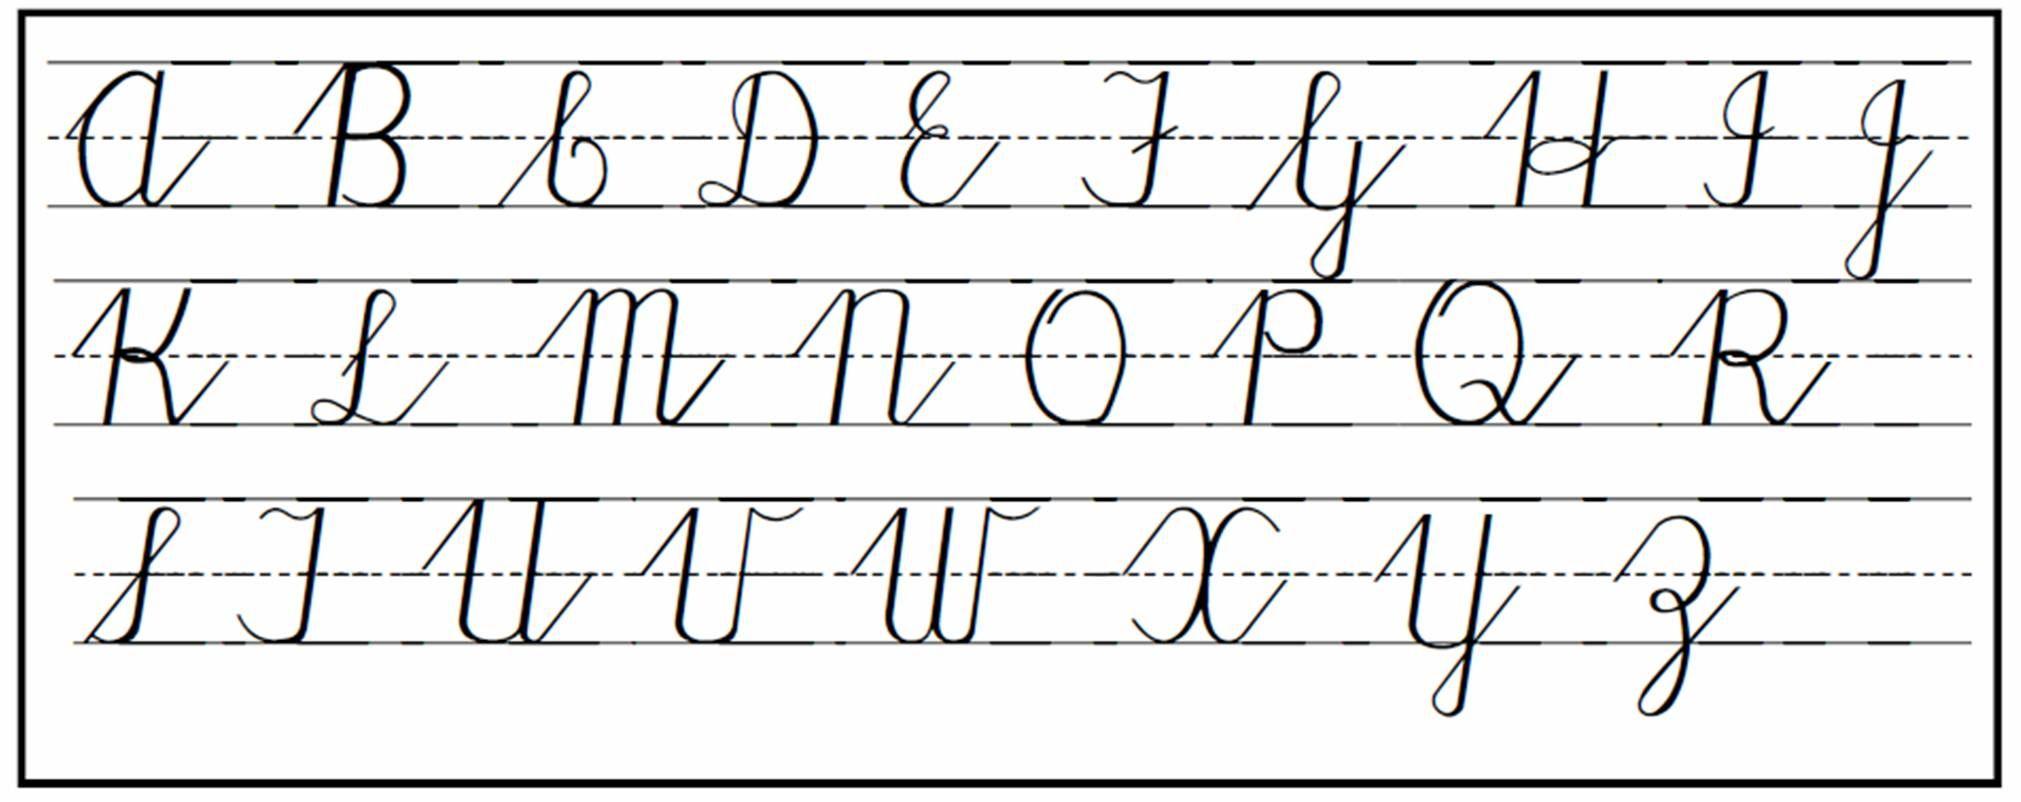 Cursive Handwriting More Tips